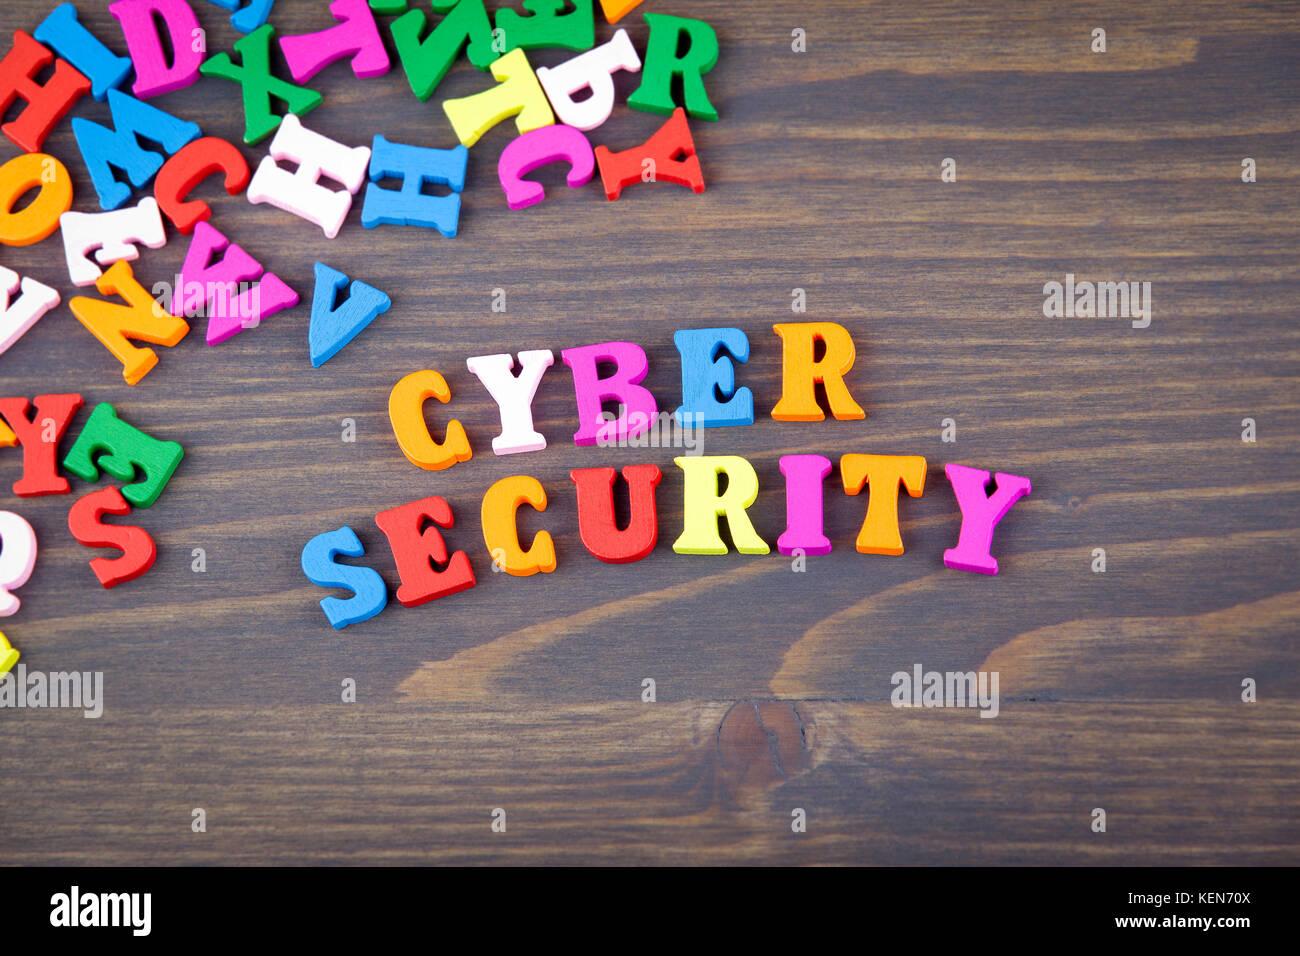 Lettere Di Legno Colorate : Cyber security vari di legno colorato lettere su una piastra